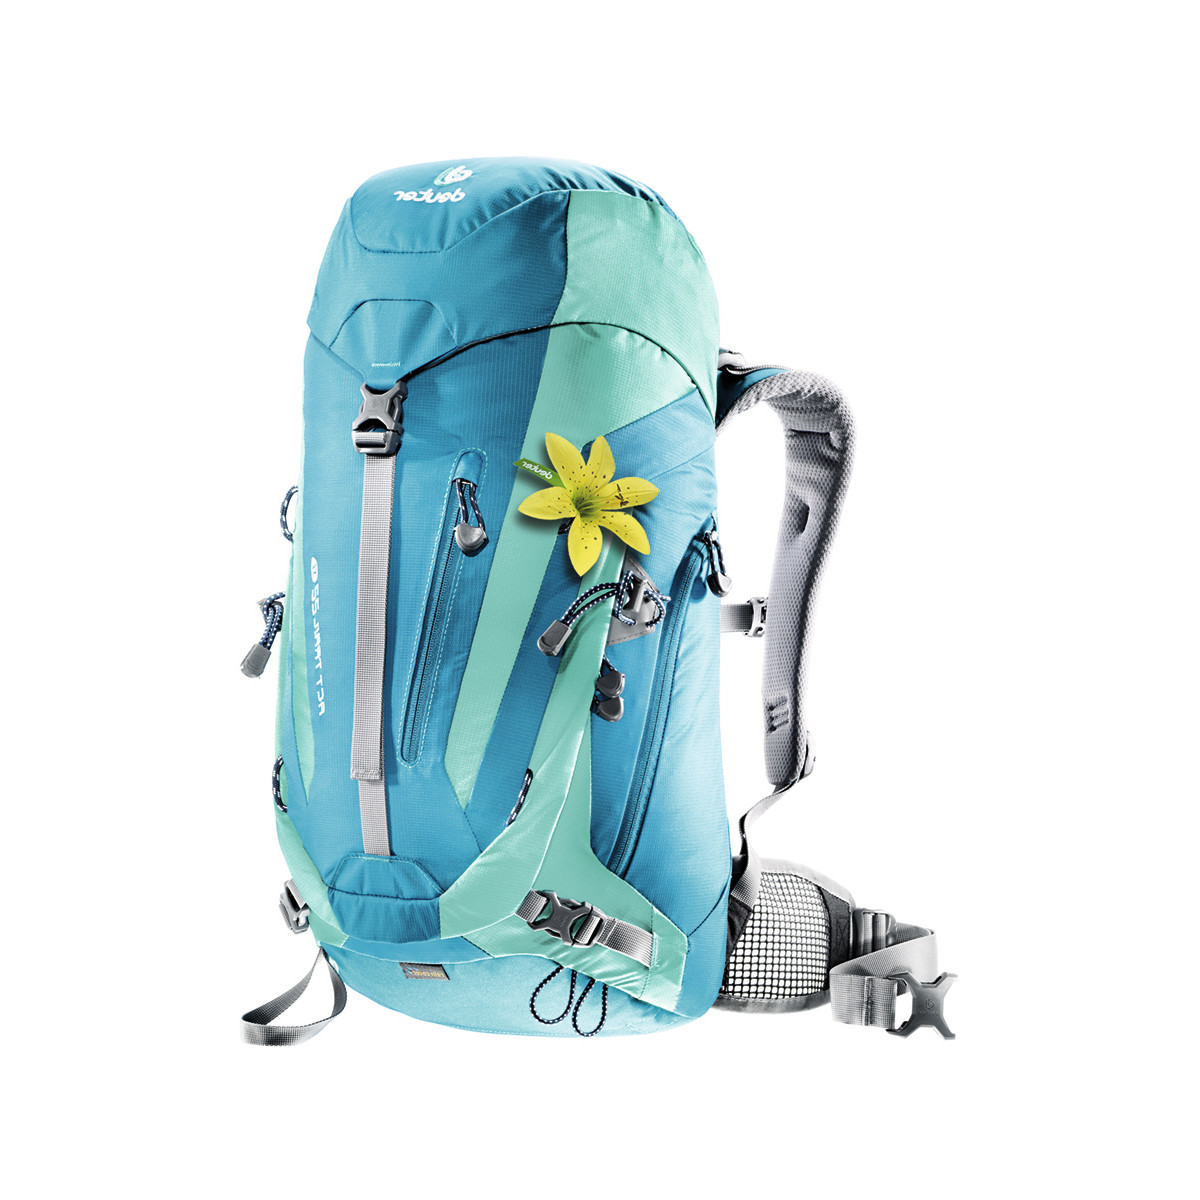 Deuter ACT Trail SL 22L Backpack - Women's